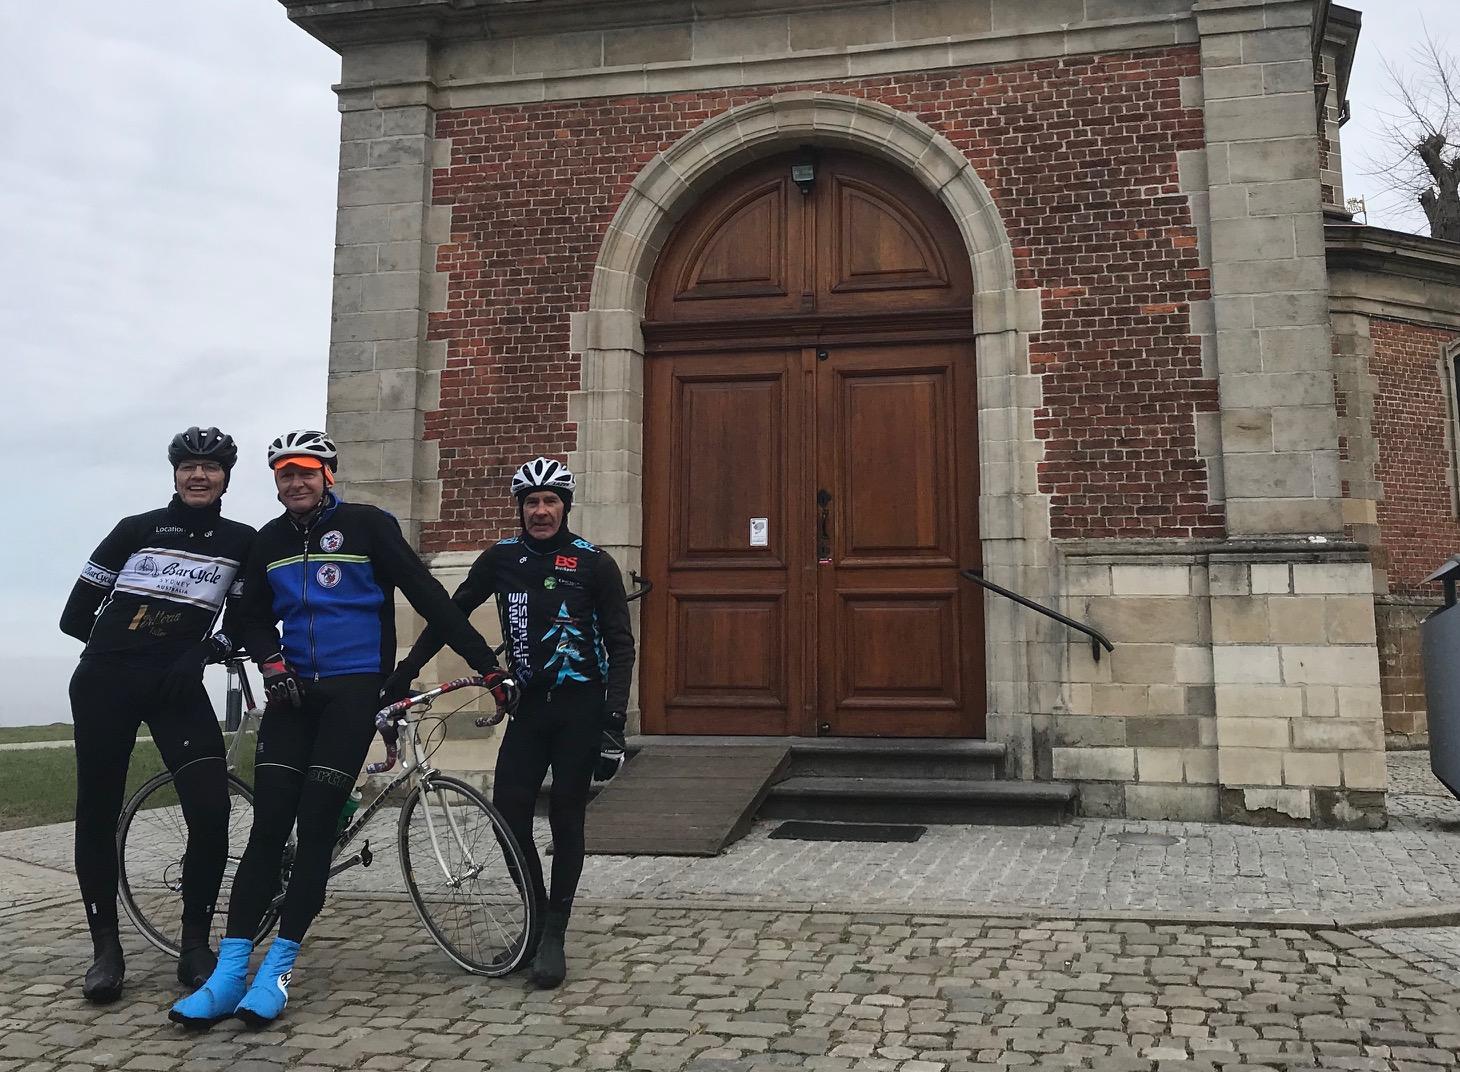 BiciSport in Flanders 18 @ 26 Mar - Chapel Church with Brian Sprouster, Daniel Vanechop & Mike Lawson